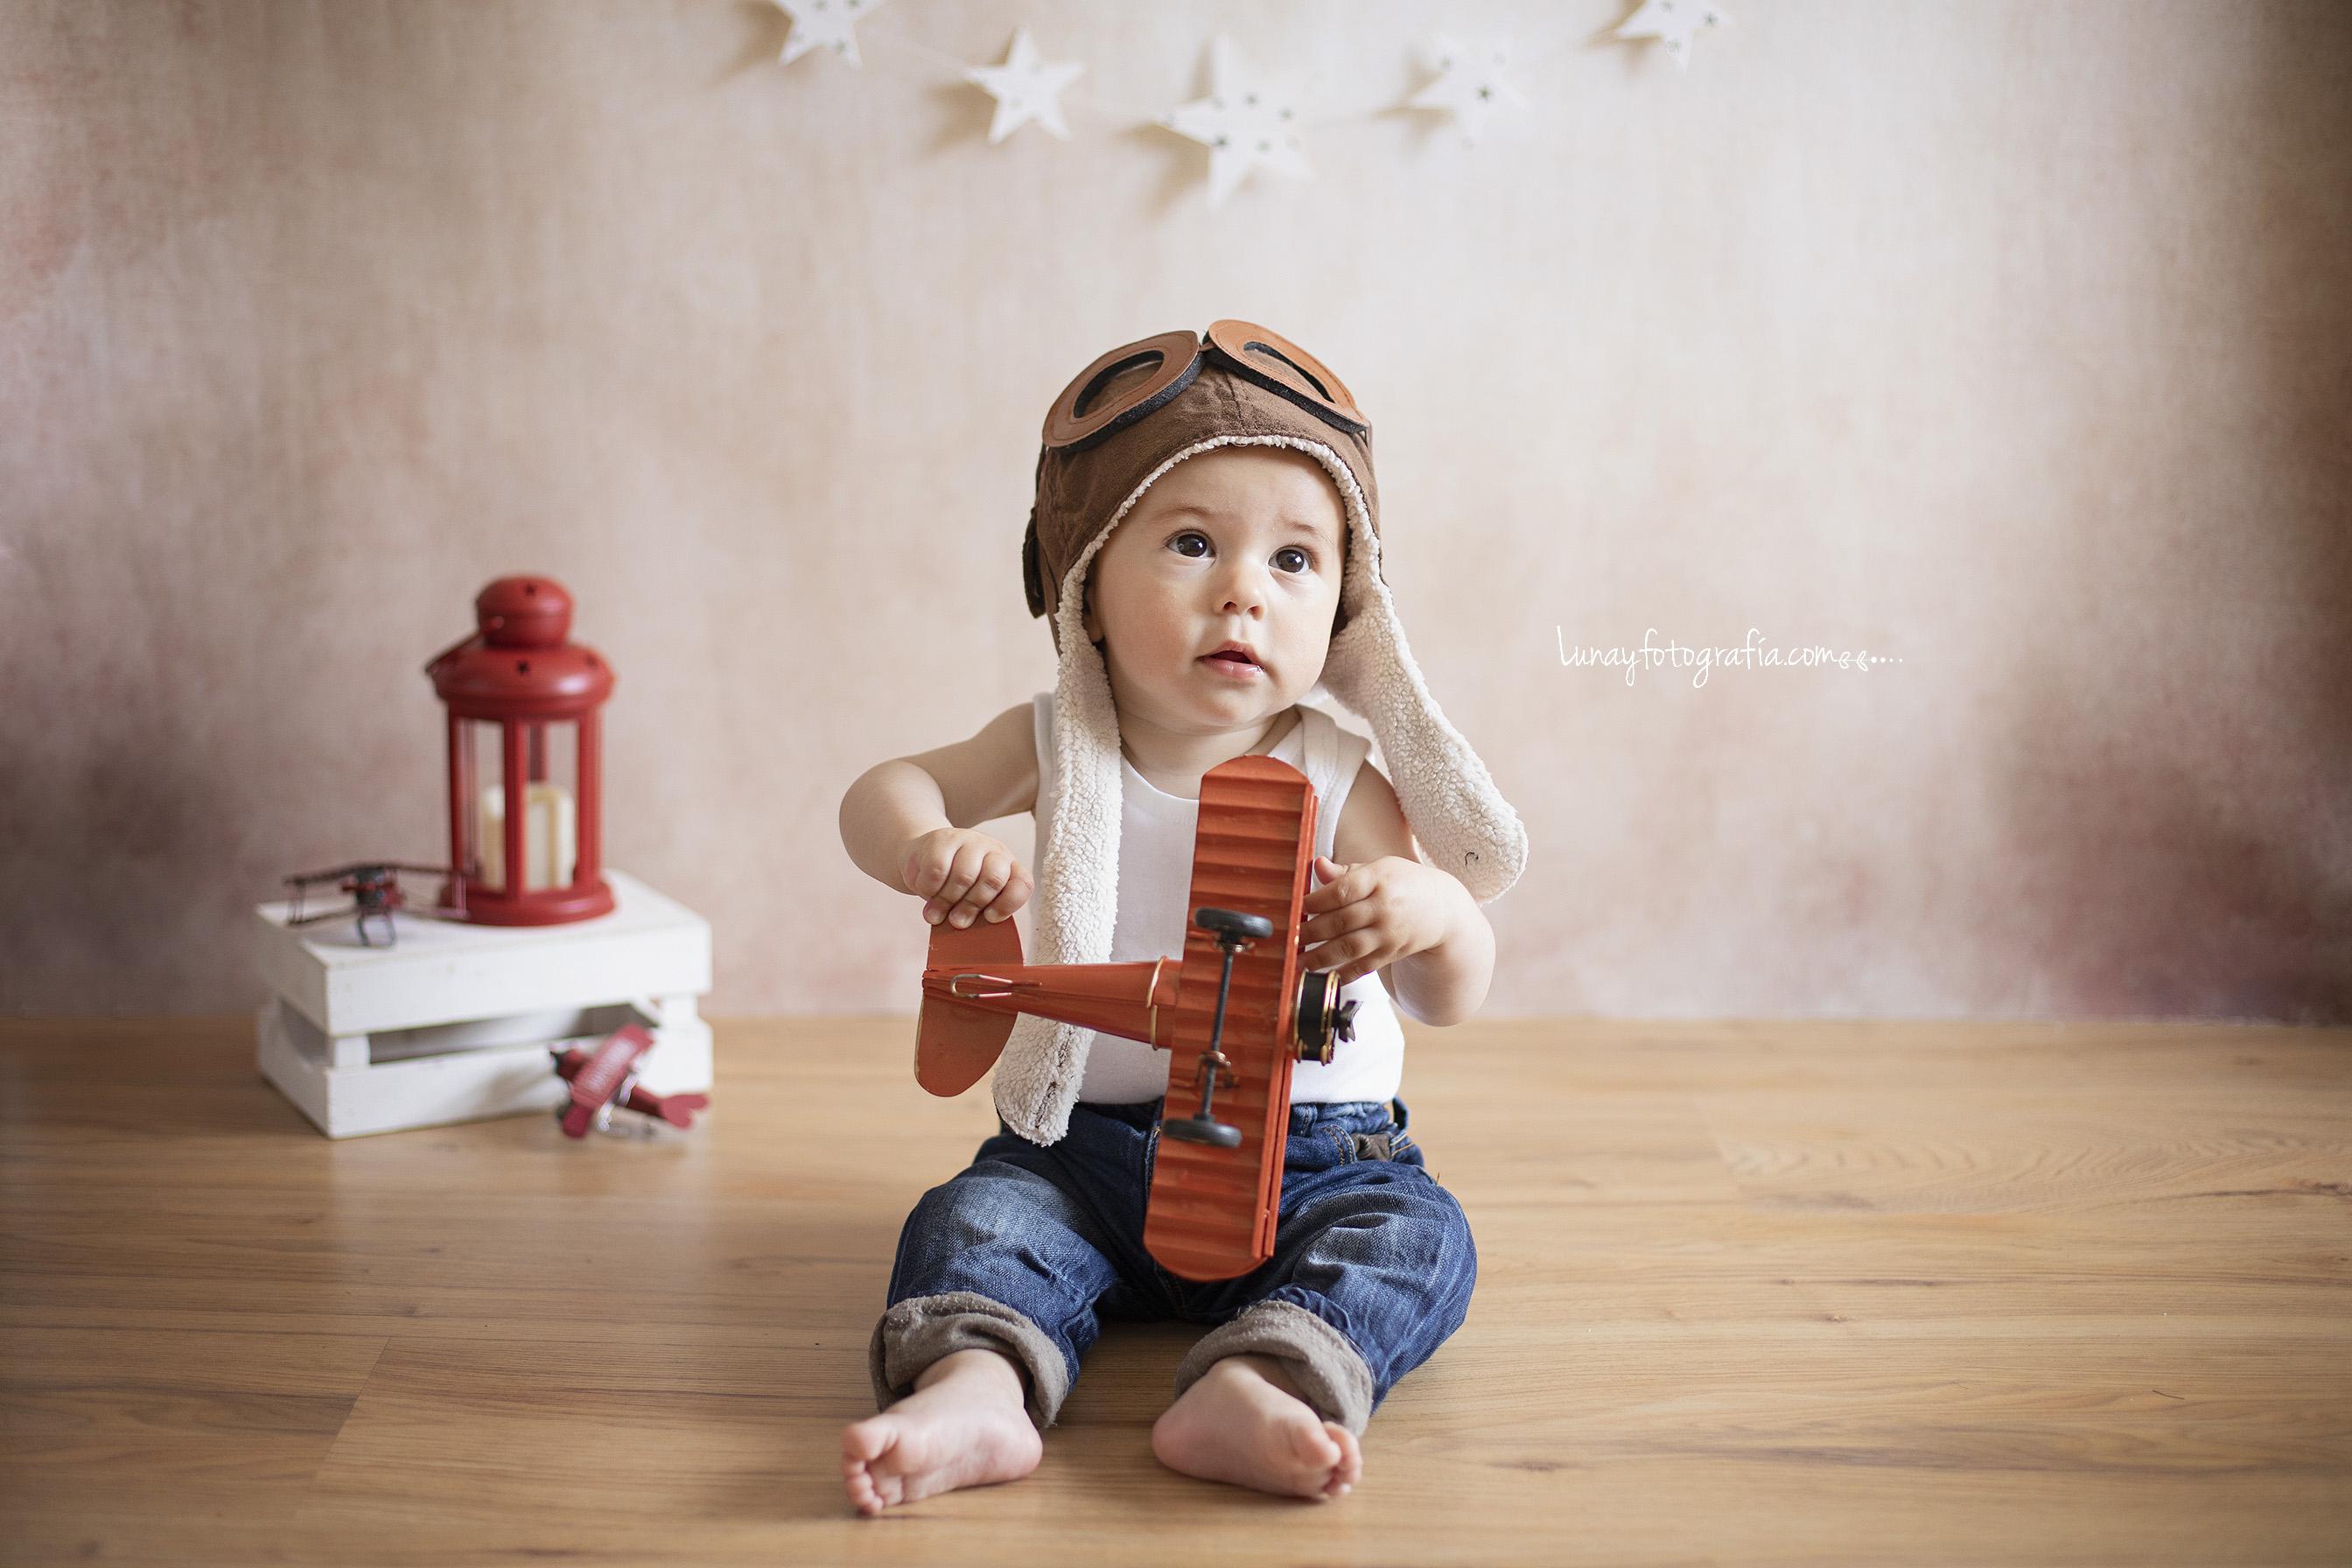 Sesión de Bebés de lullaby fotografia